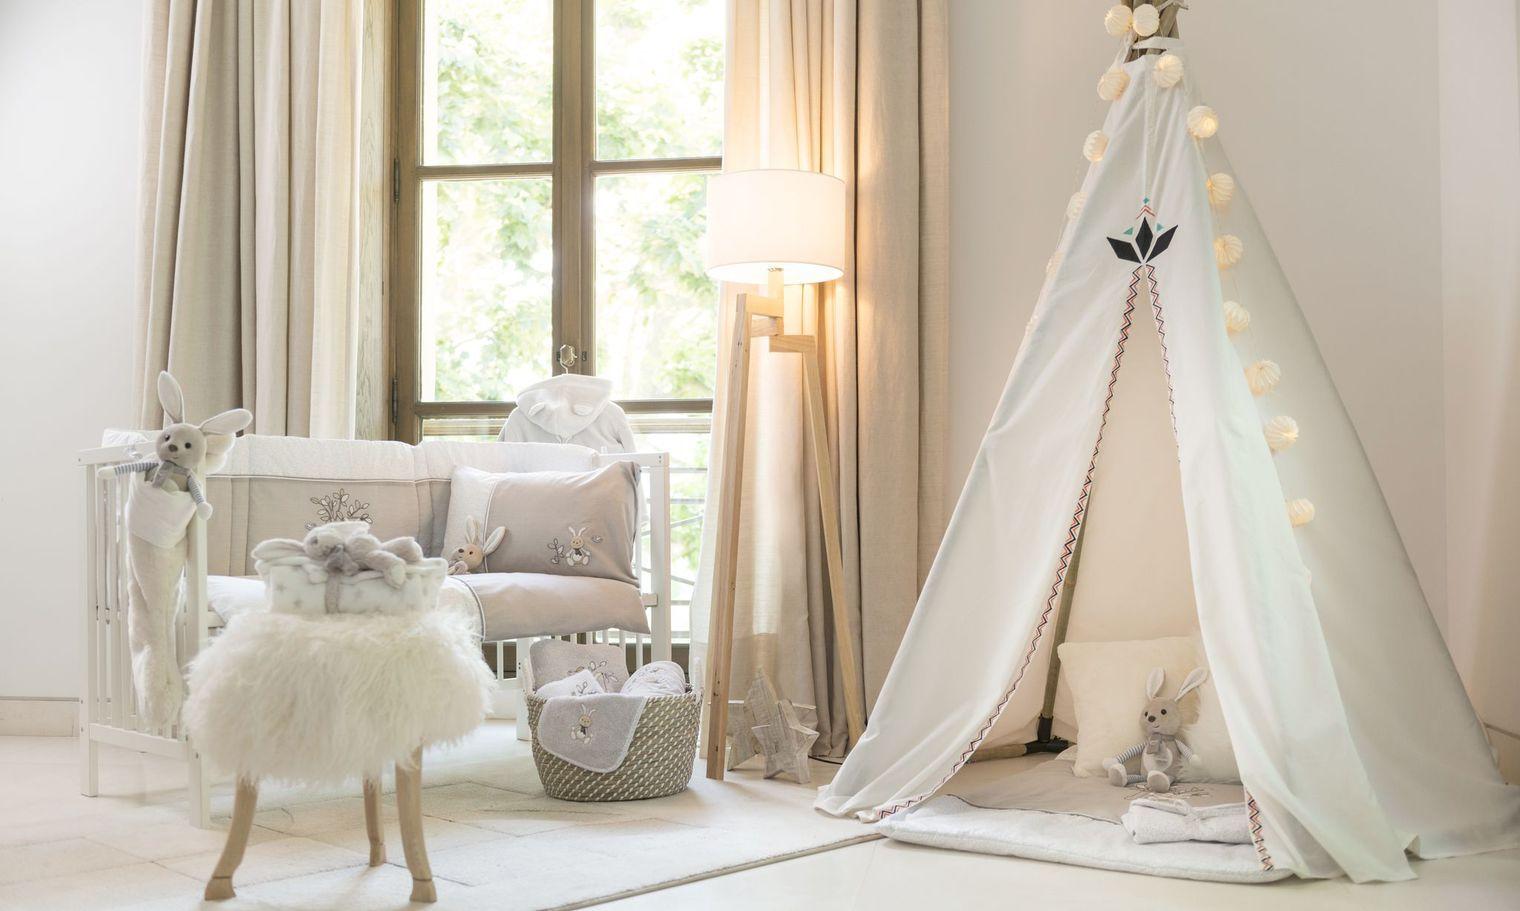 Chambre Bebe Des Idees Deco Cosy Decor Room Toddler Rooms